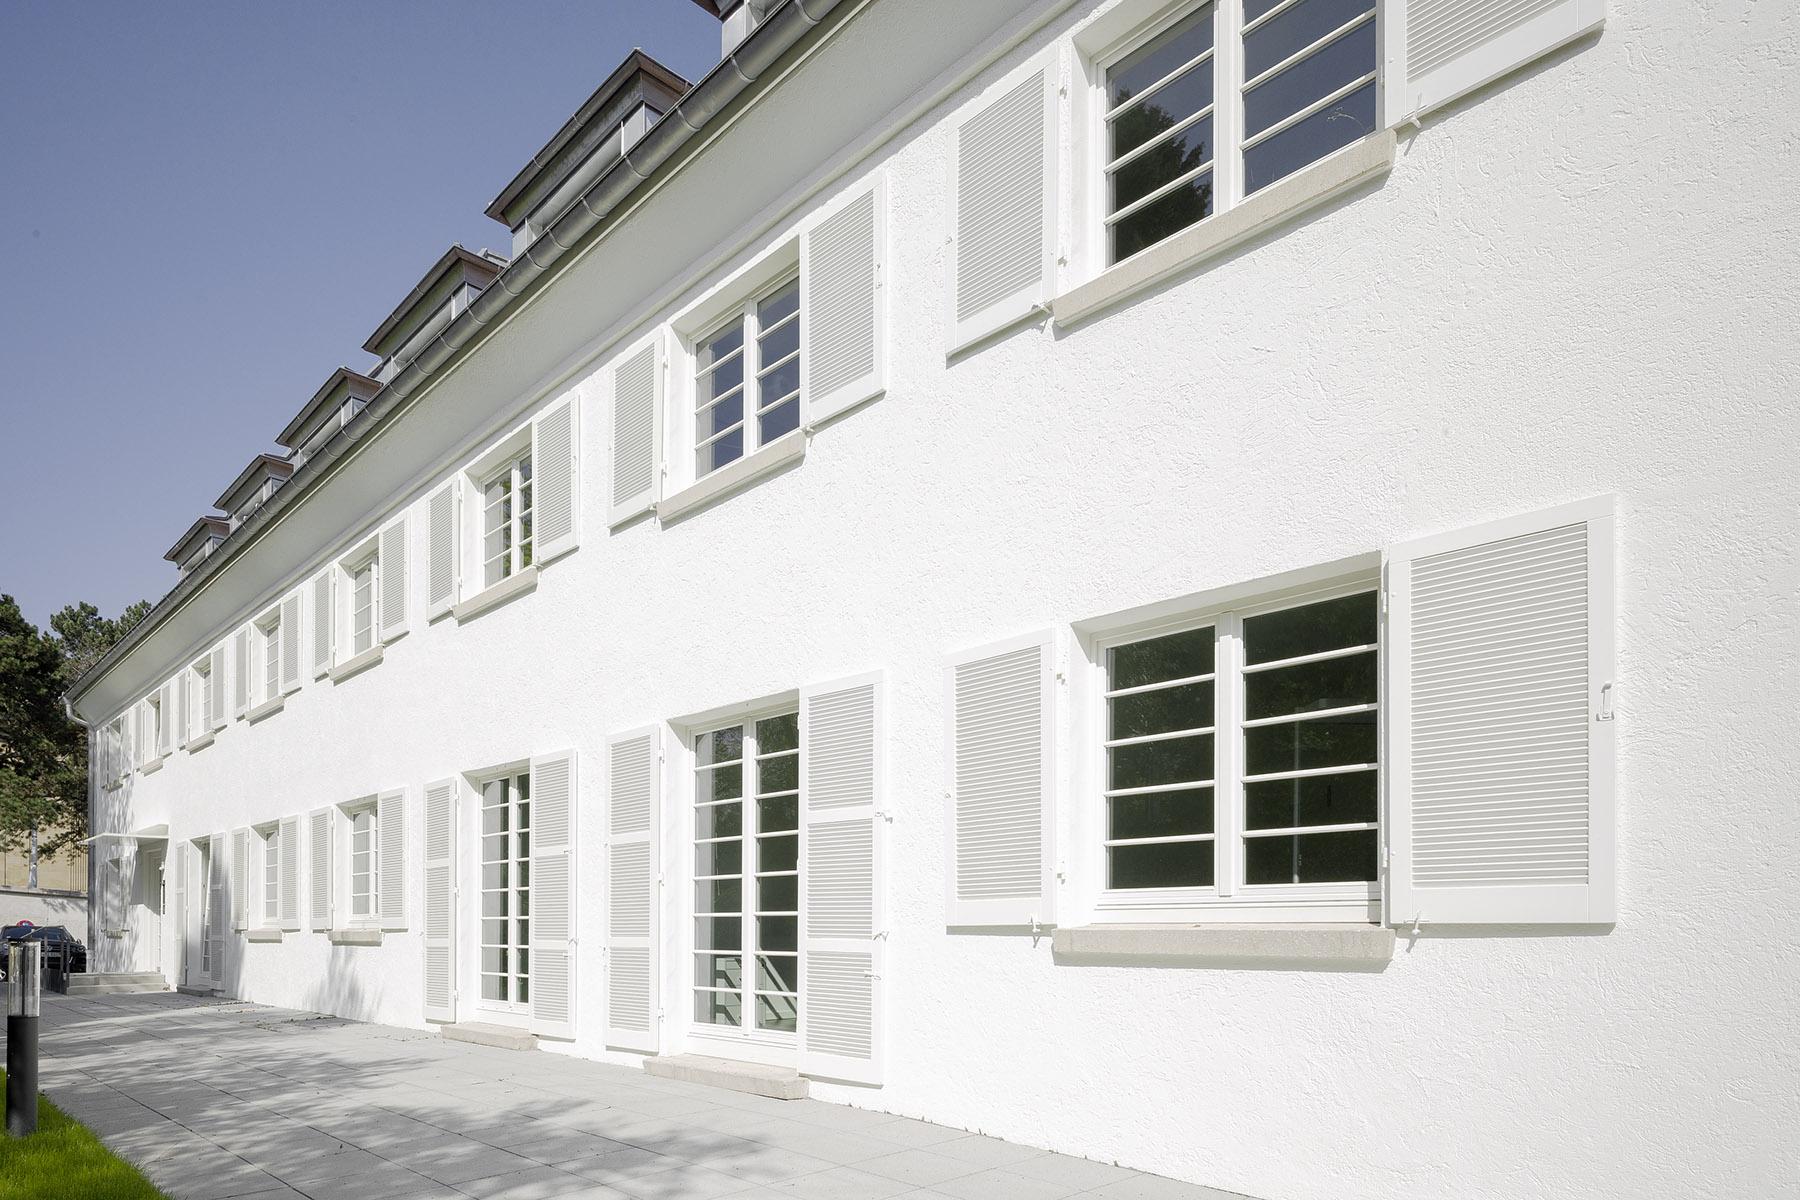 kaestle&ocker - Sandbergerstraße